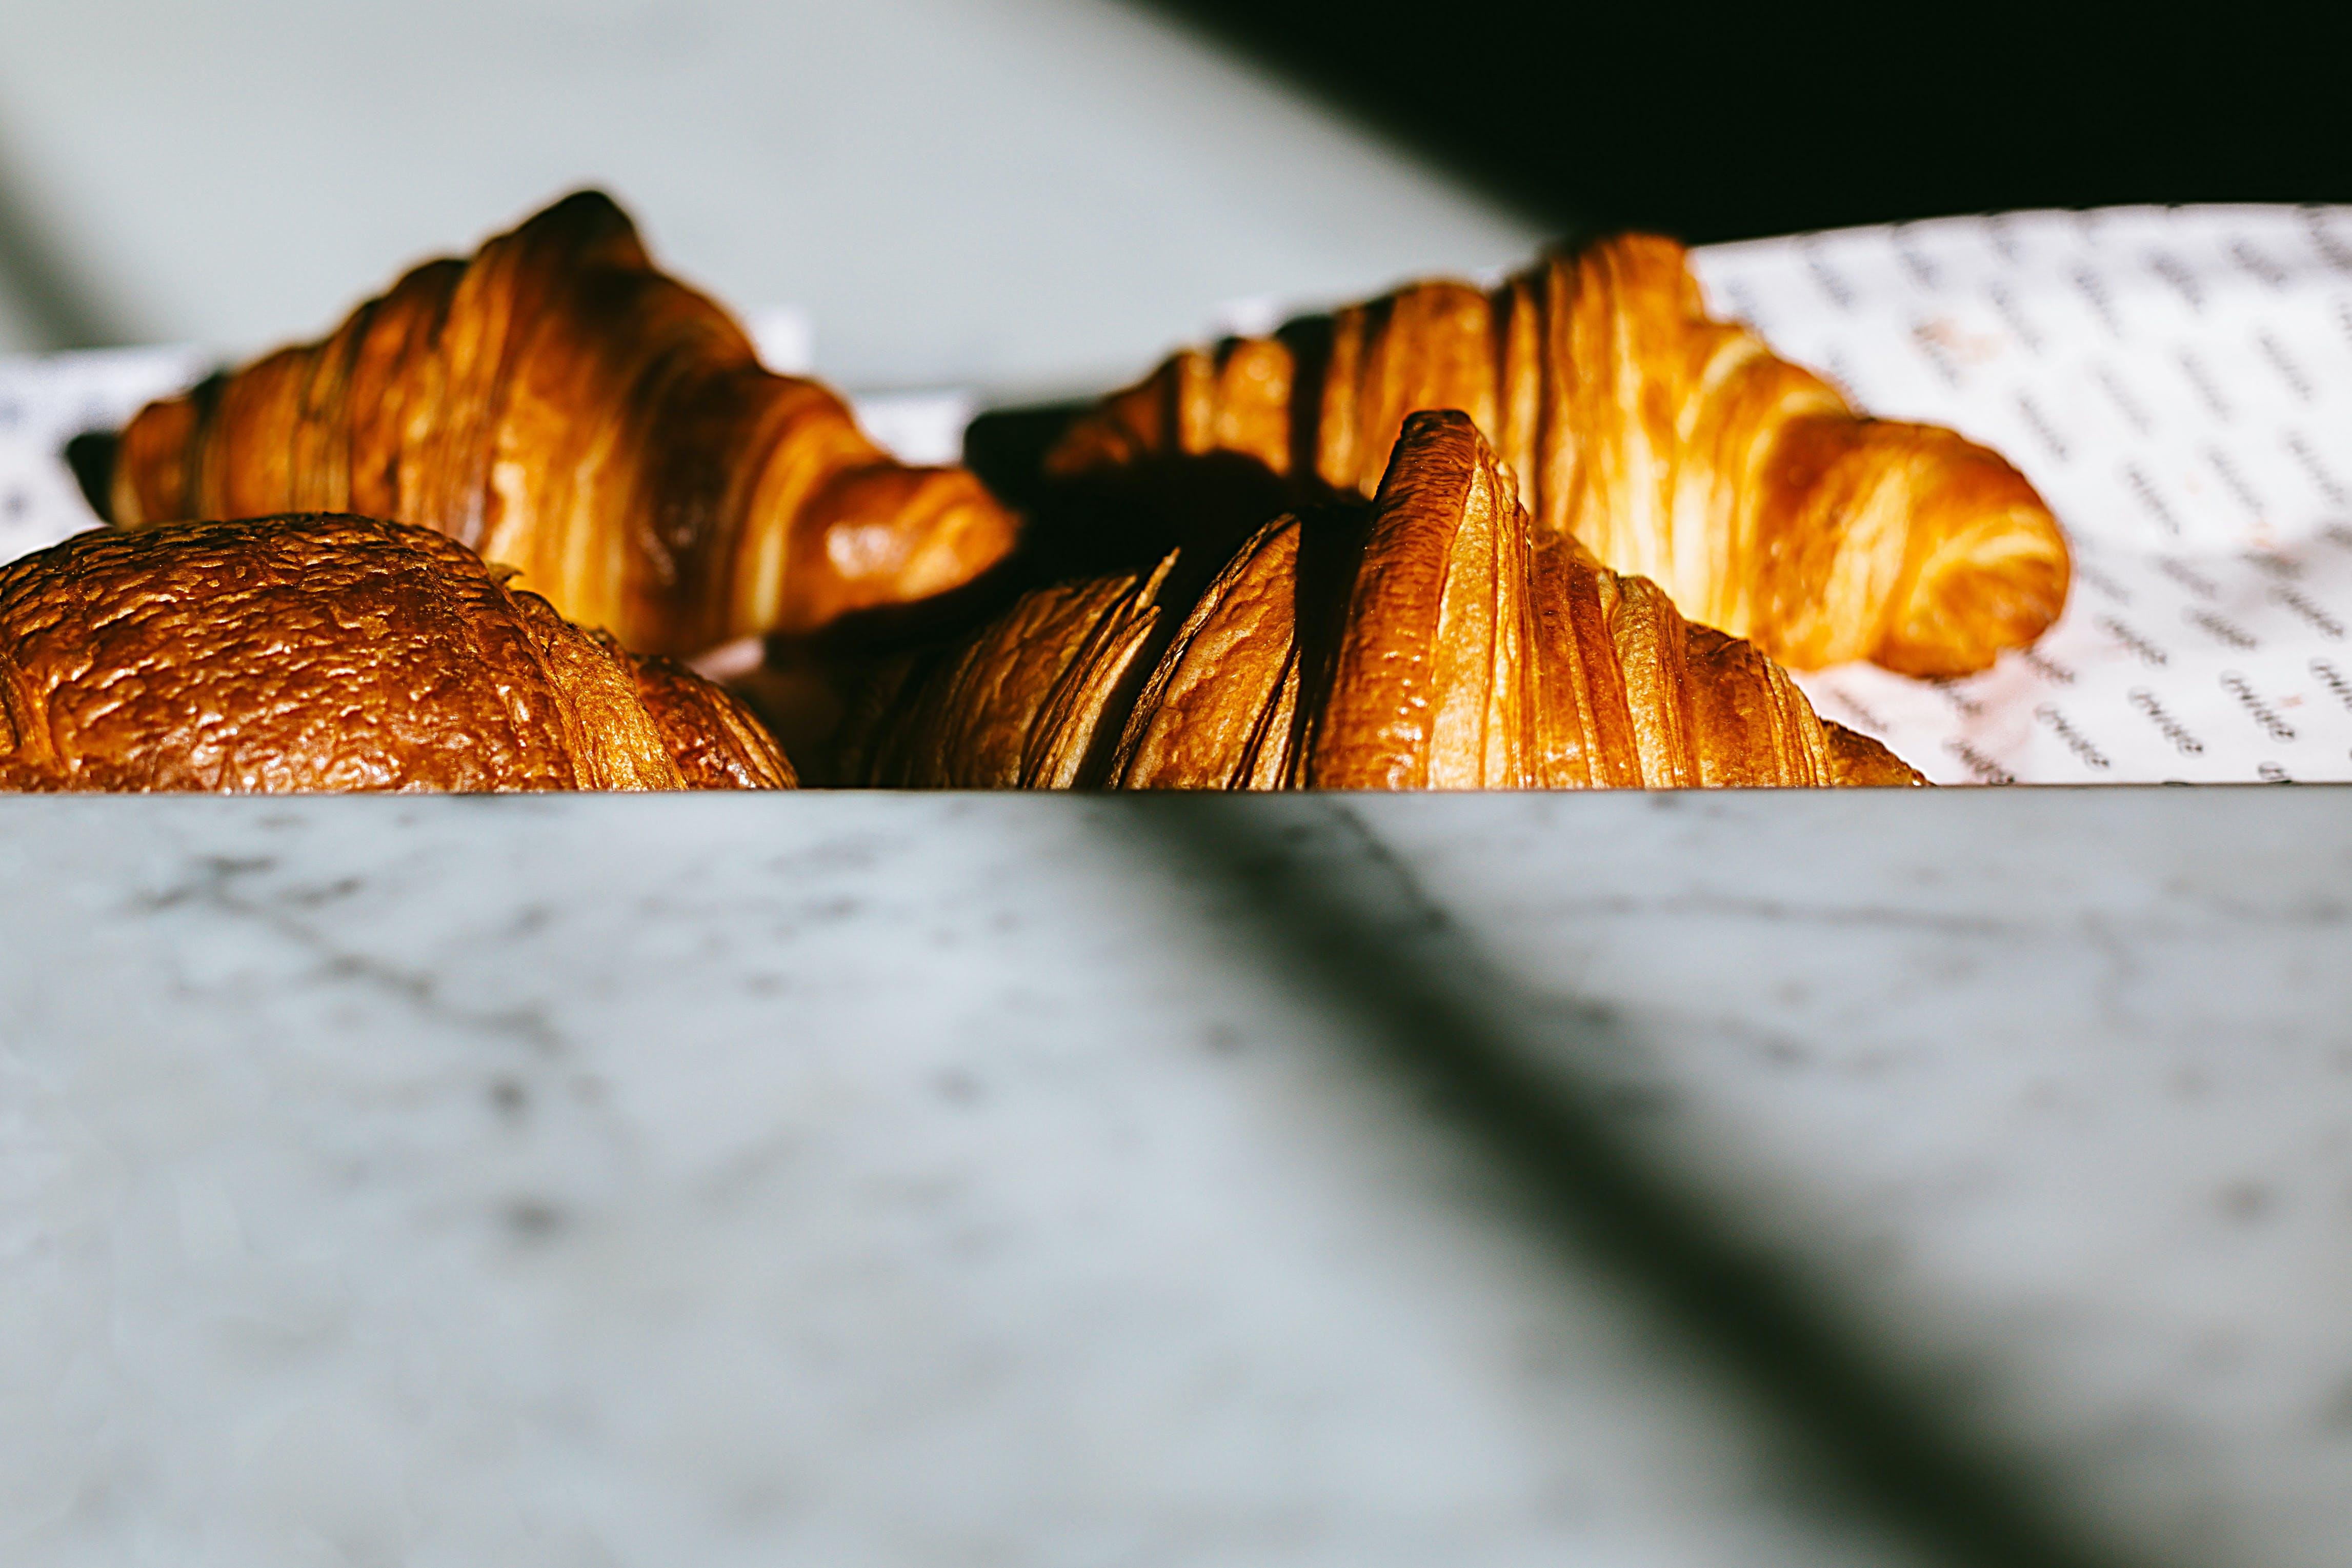 Kostenloses Stock Foto zu backen, bäckerei, brot, croissant